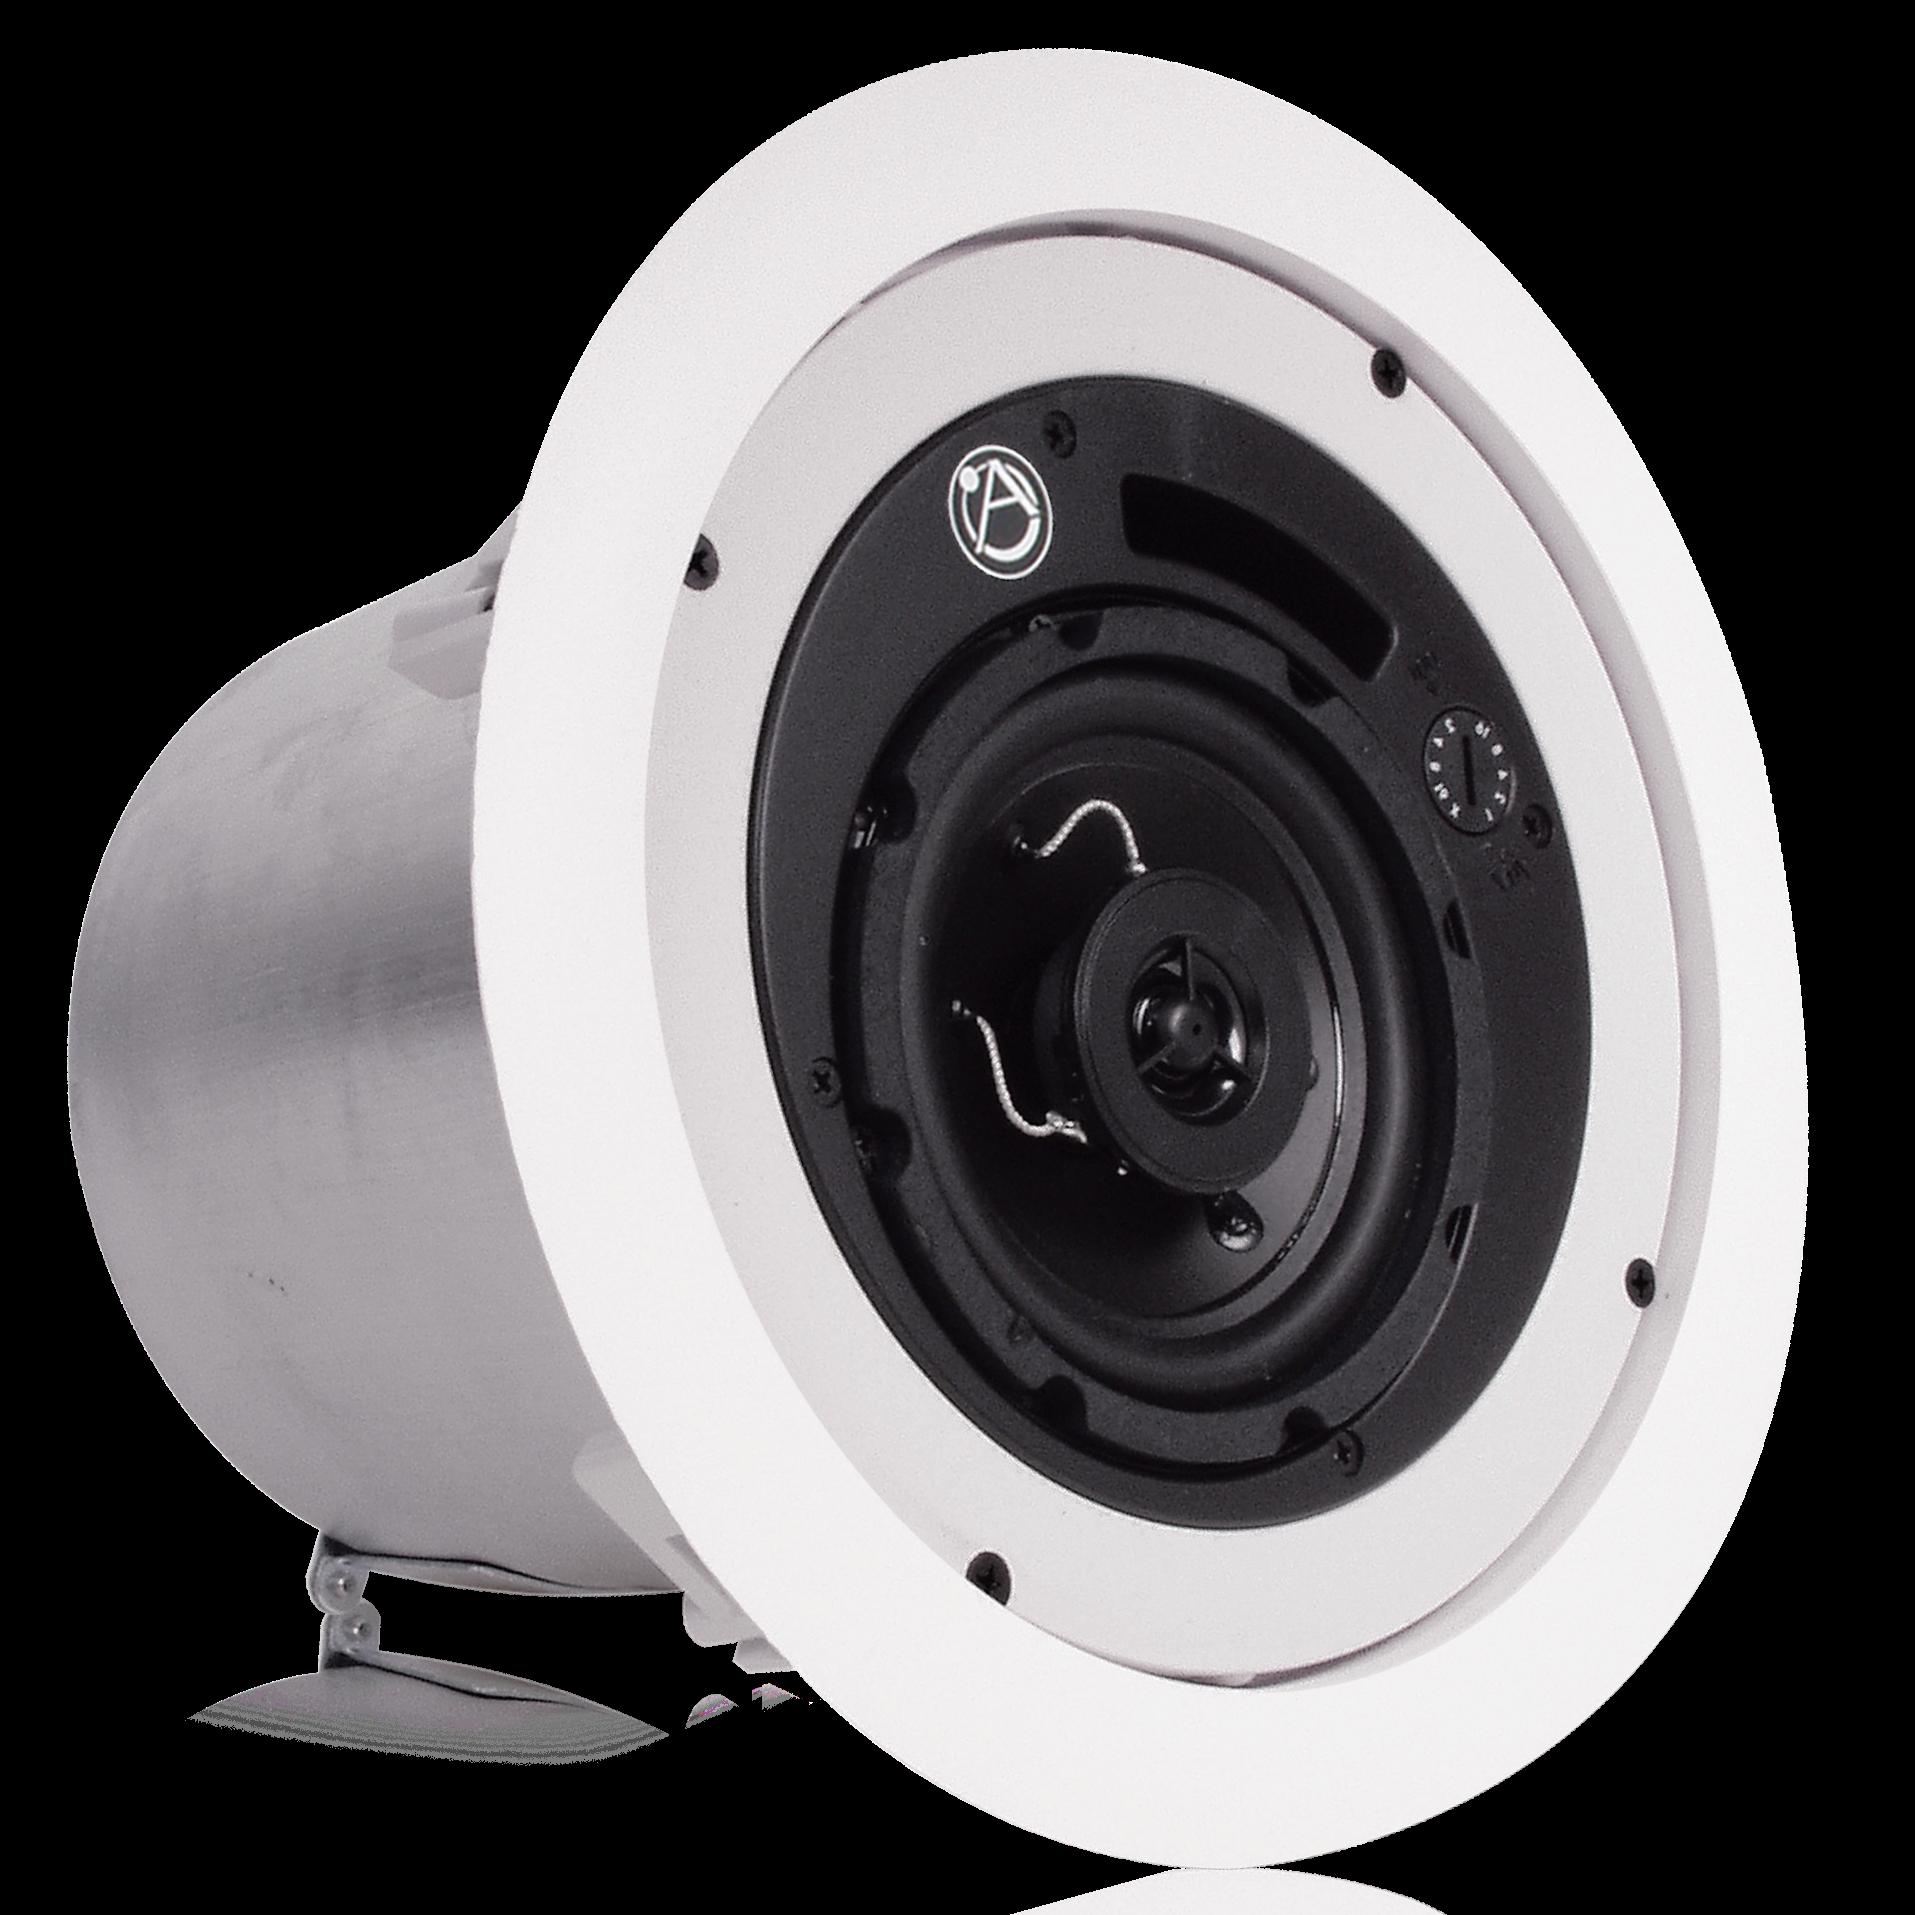 4 Coaxial In Ceiling Loudspeaker With 16 Watt 70 100v Transformer 2 Way Speaker Wiring Diagram And Ported Enclosure Atlasied